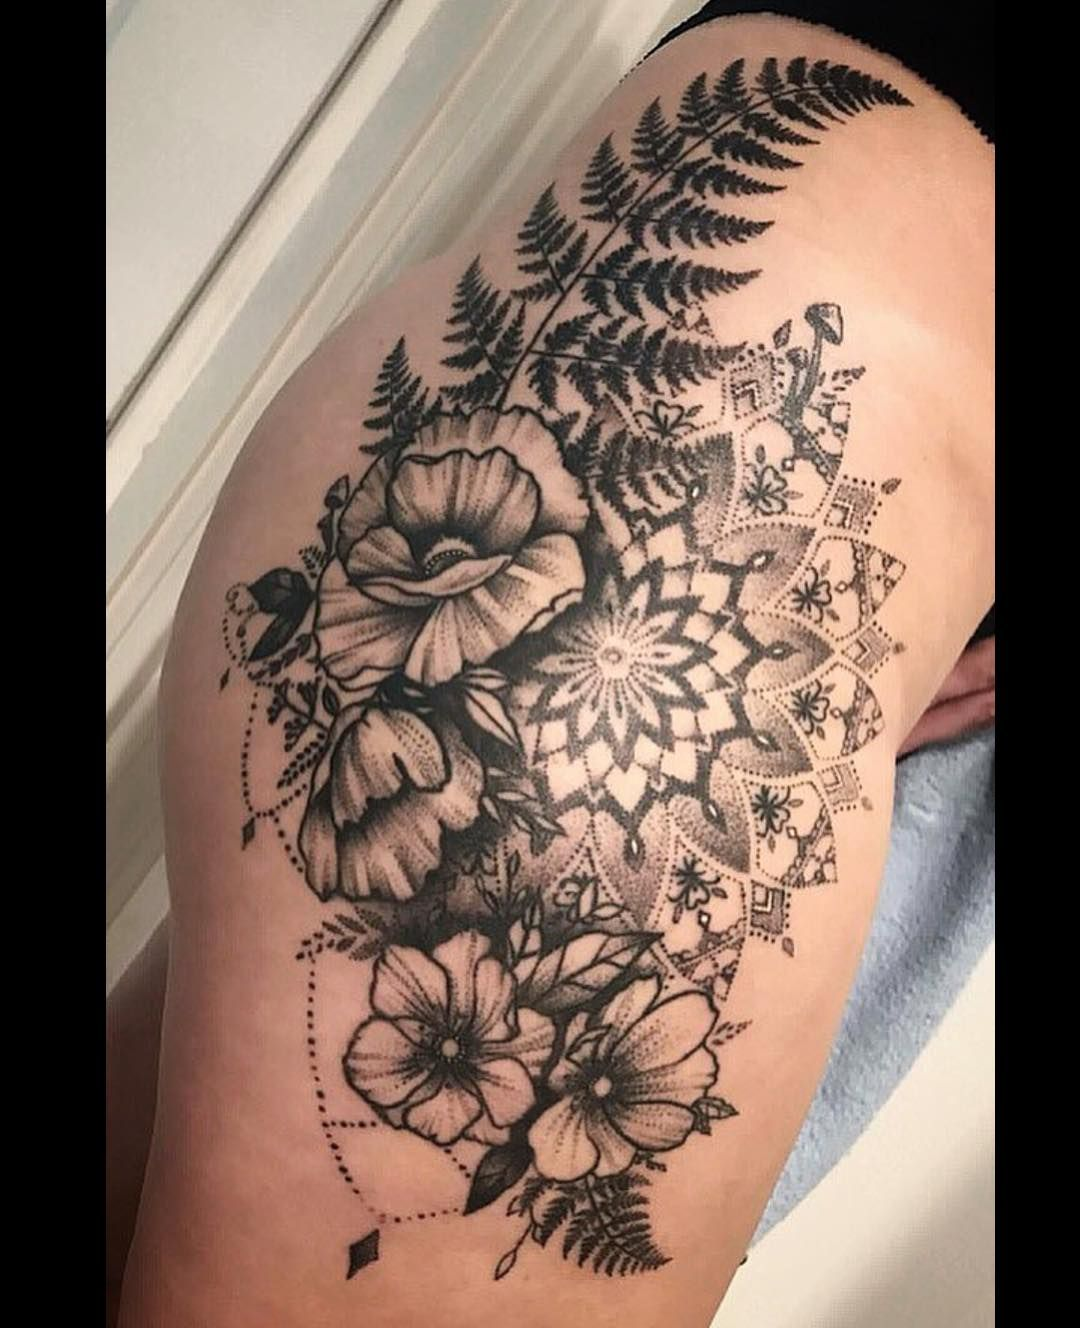 50 Of The Most Beautiful Mandala Tattoo Designs For Your Body Soul Floral Mandala Tattoo Mandala Tattoo Design Mandala Hip Tattoo